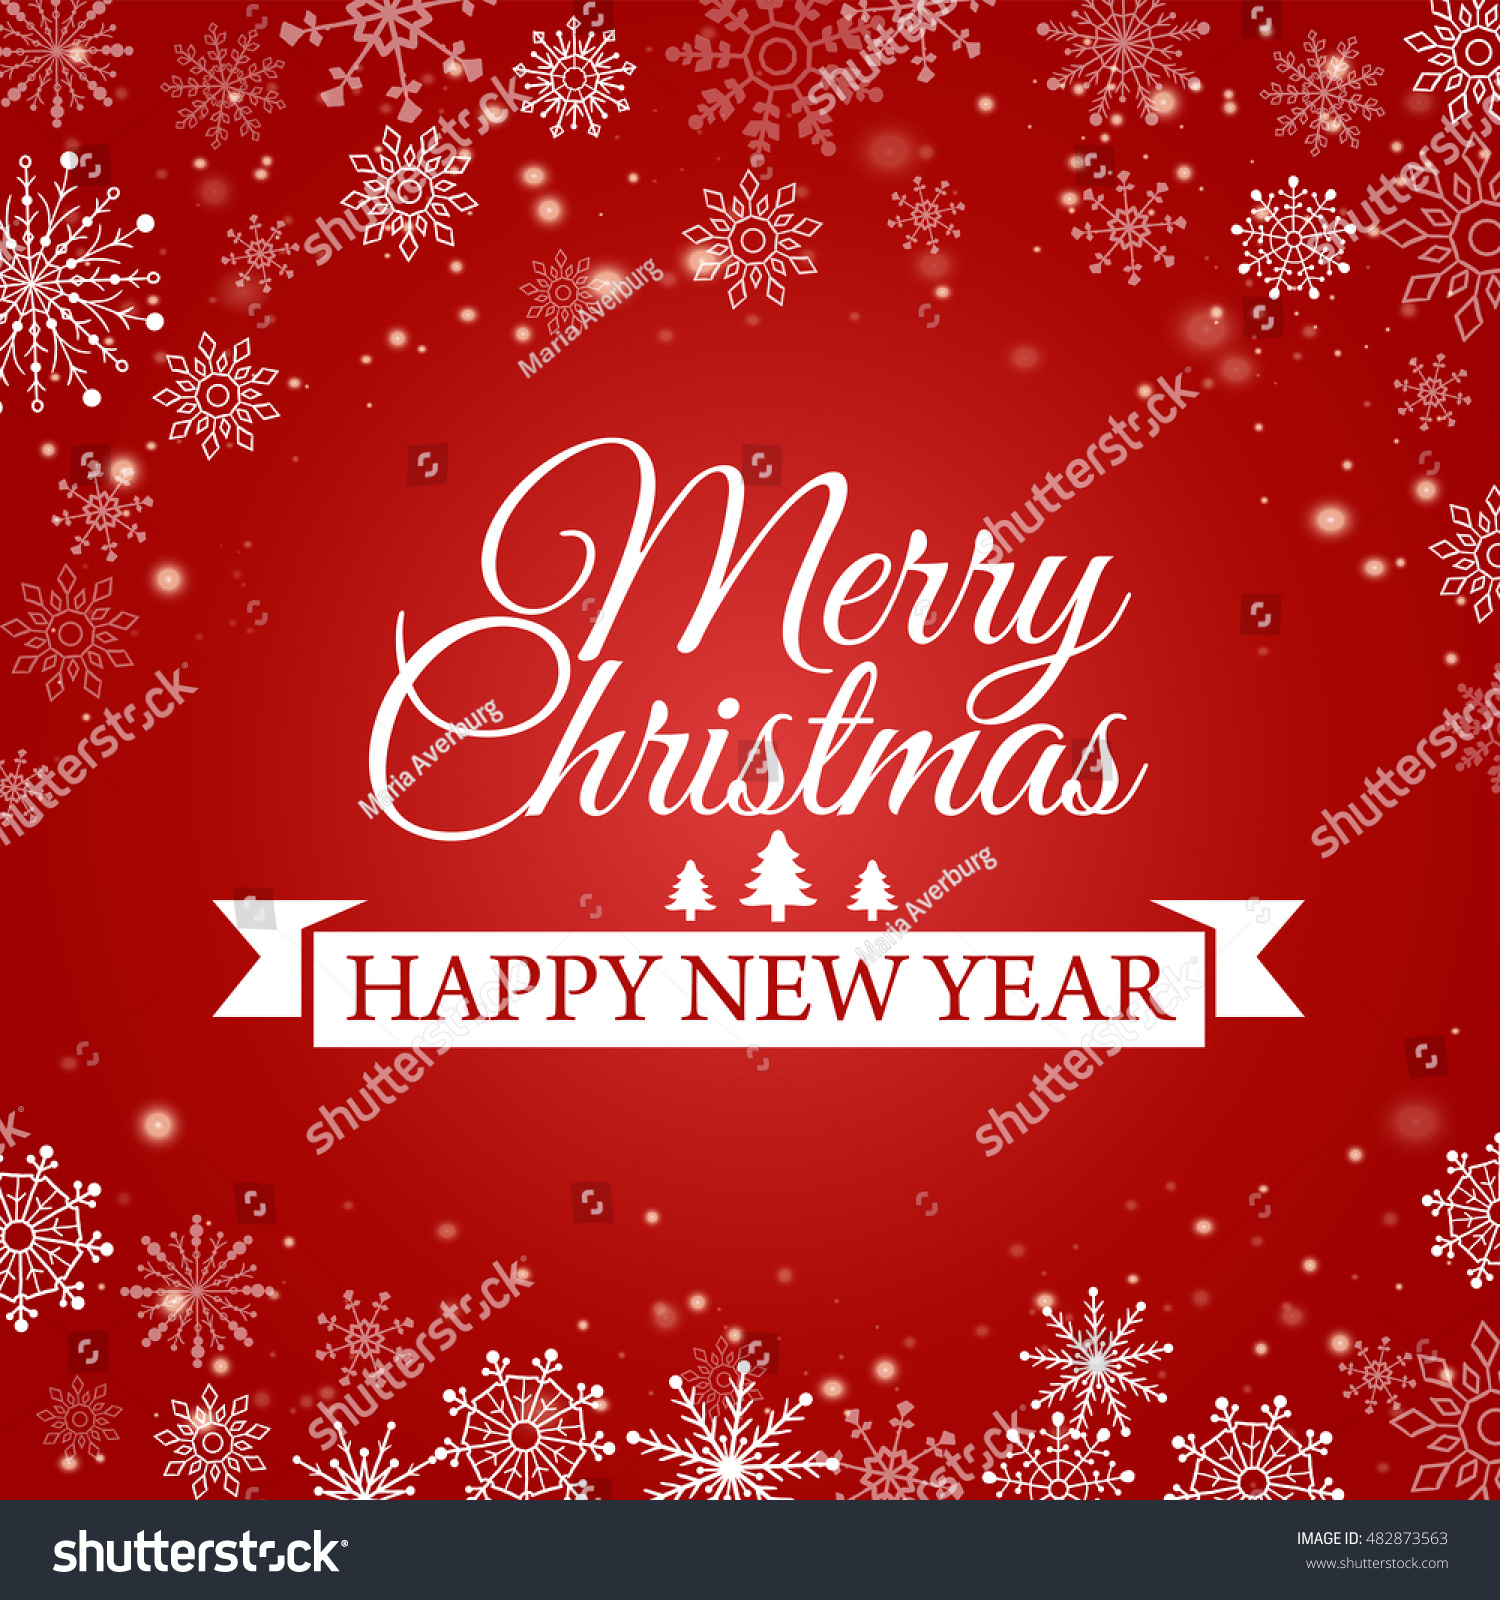 Ecard happy new year merry christmas stock vector 482873563 e card for happy new year and merry christmas vector illustration kristyandbryce Gallery